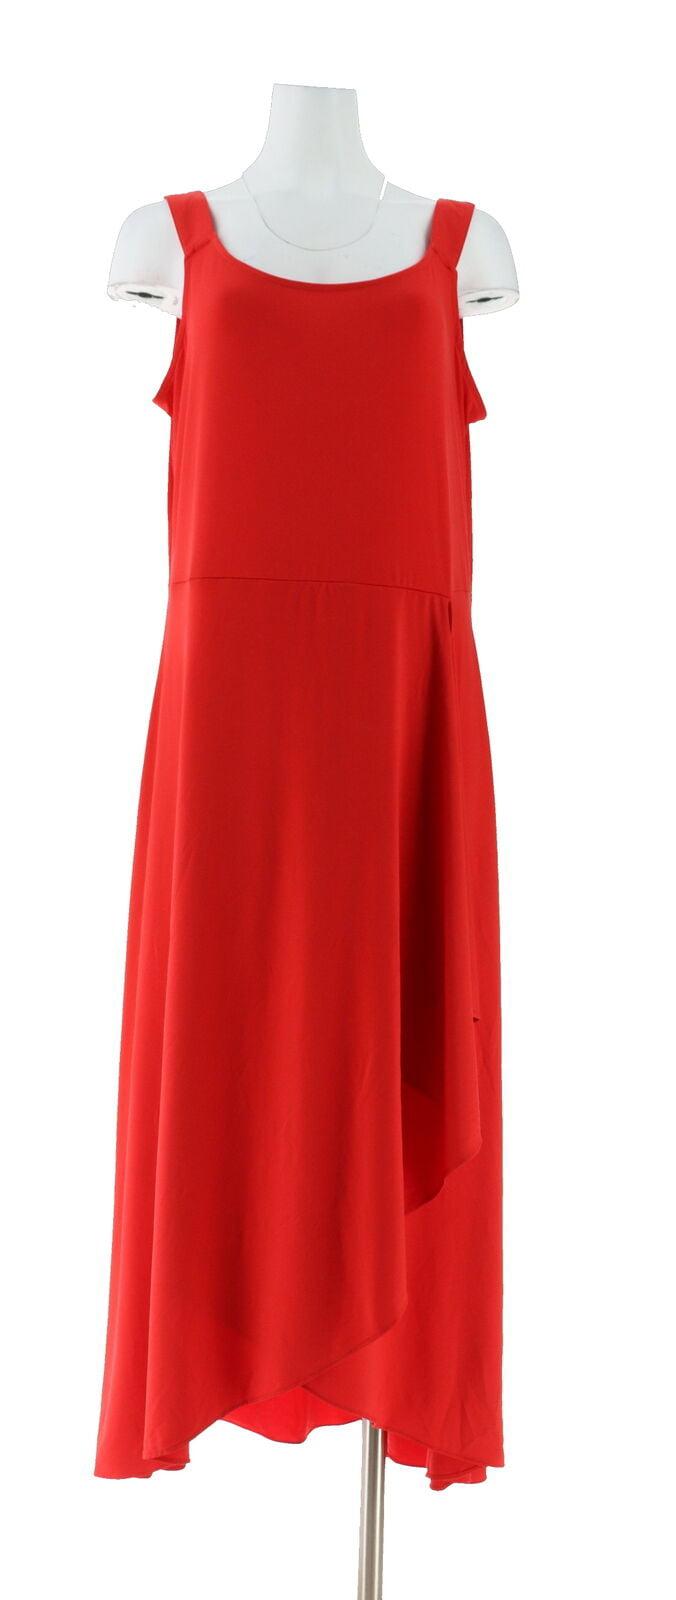 BROOKE SHIELDS Timeless Petite Slvless Maxi Dress A307771